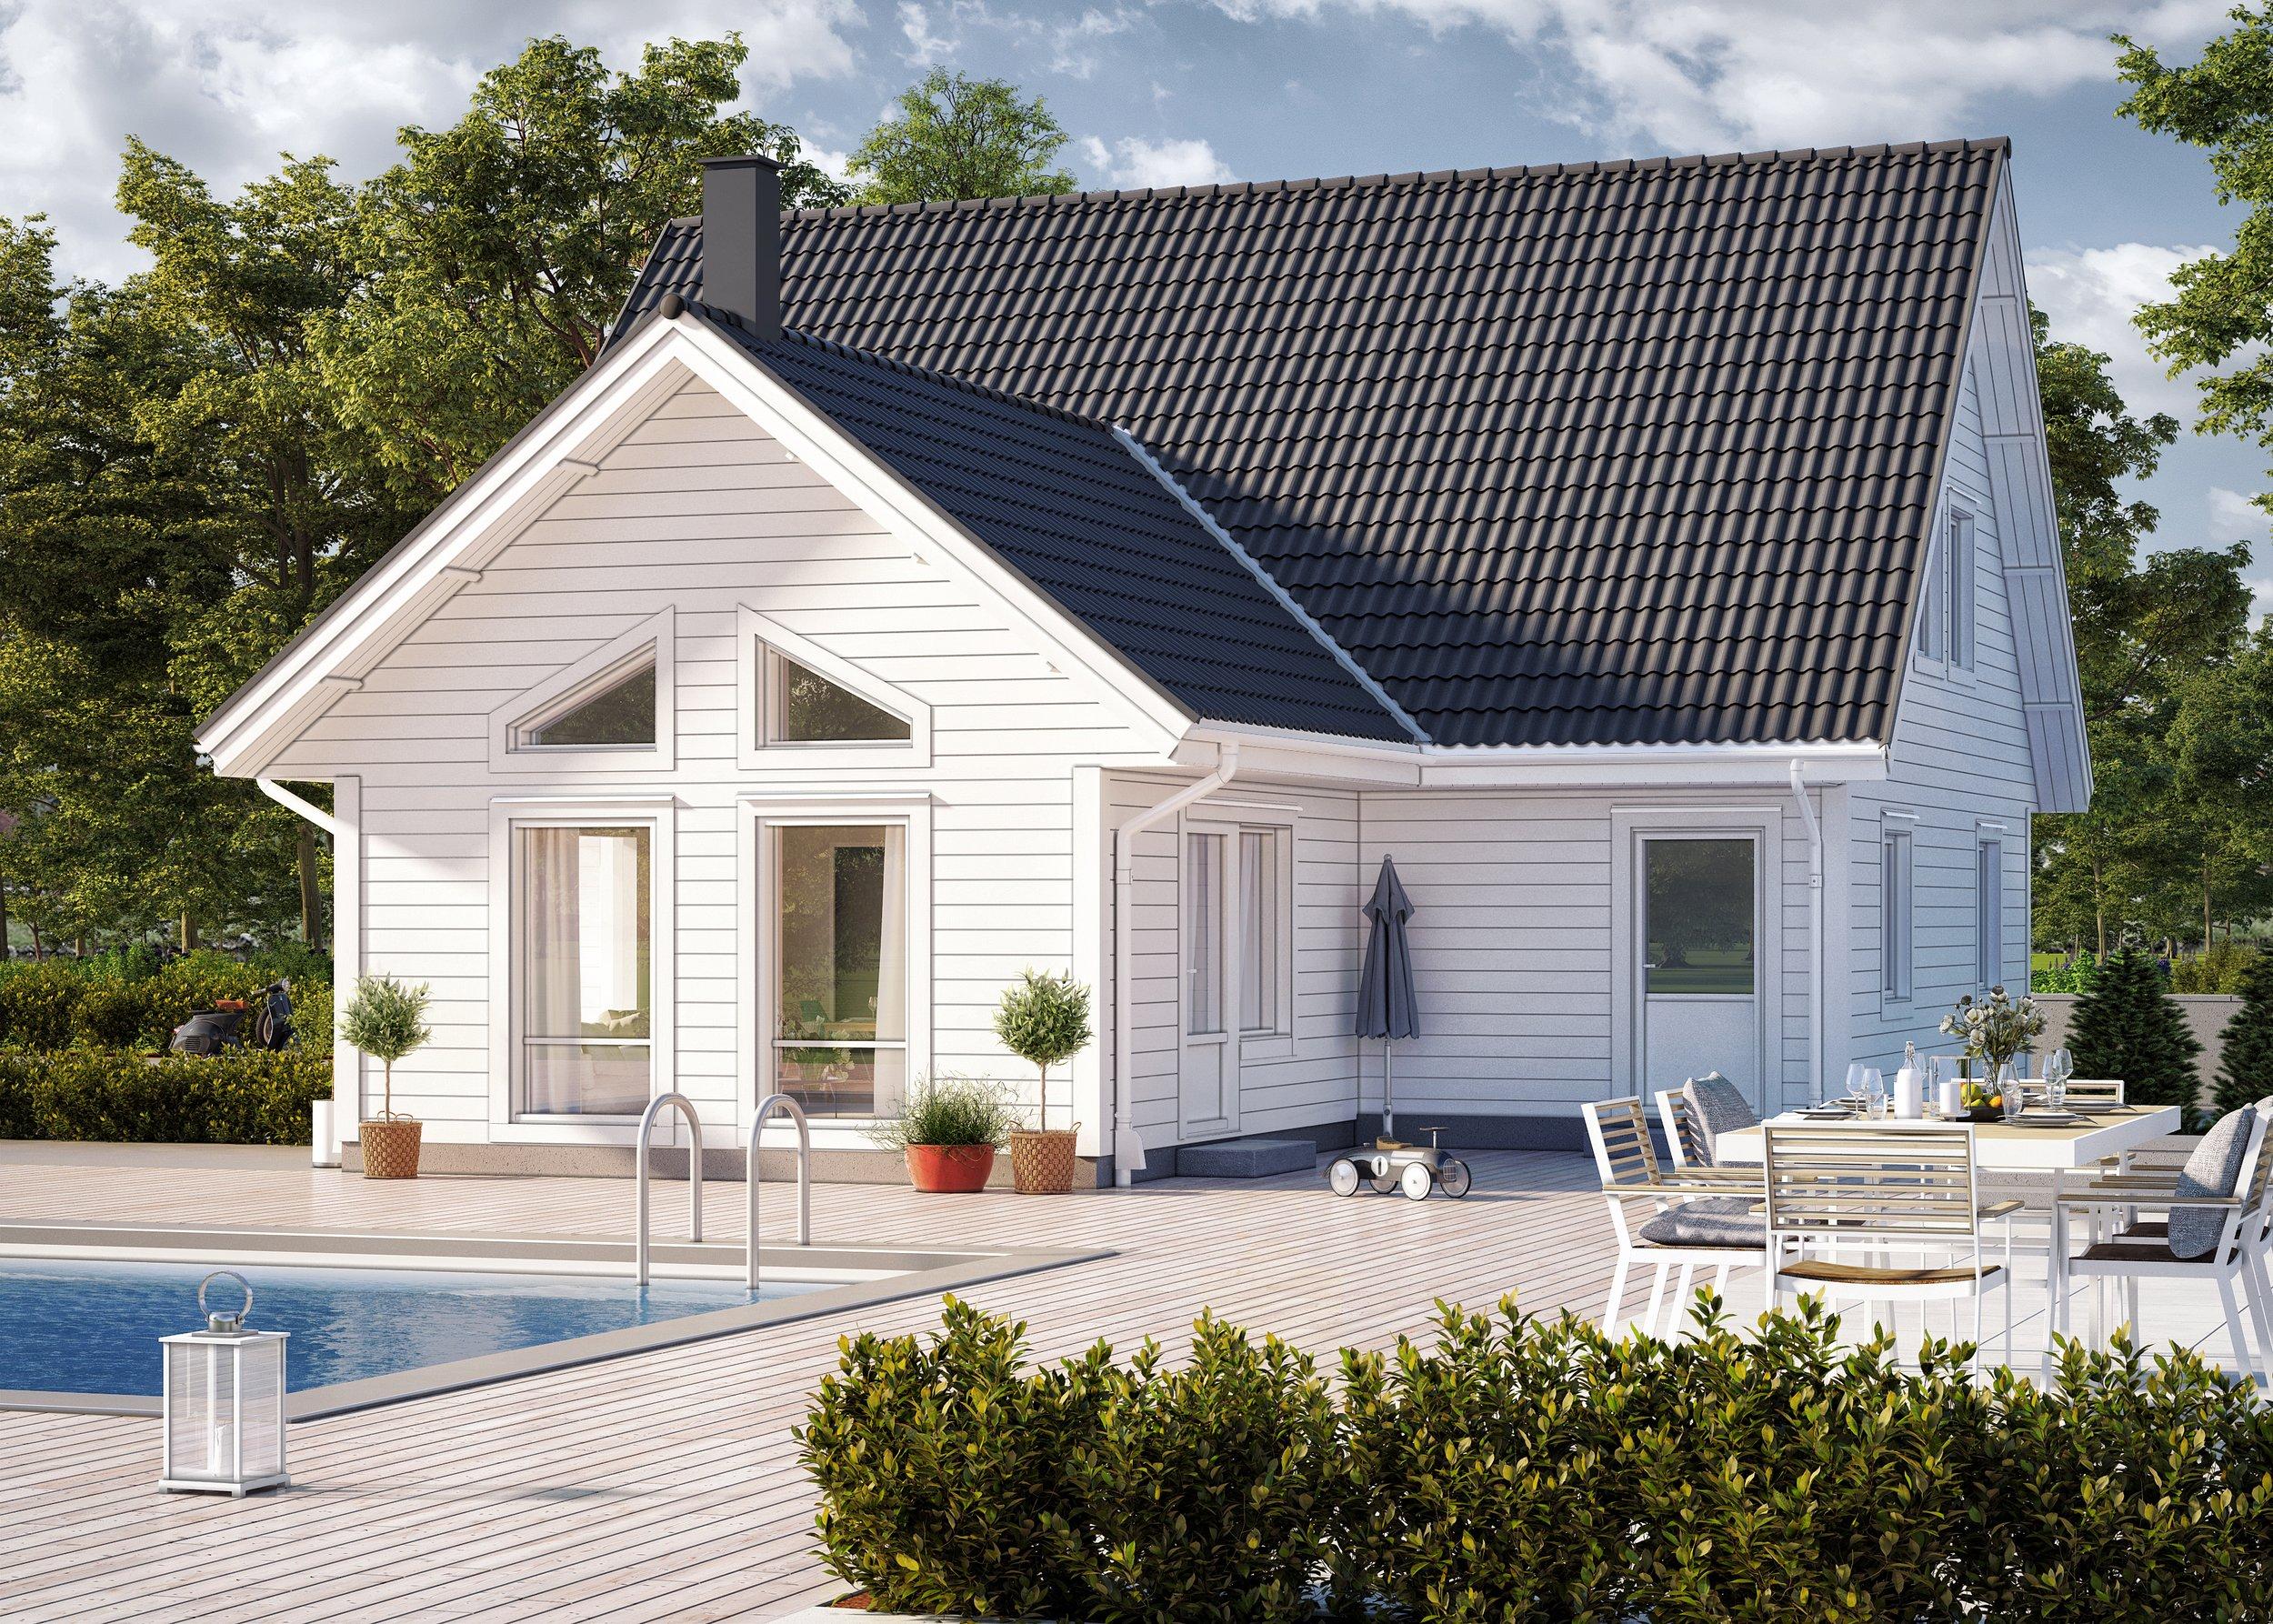 Villa Utansjö